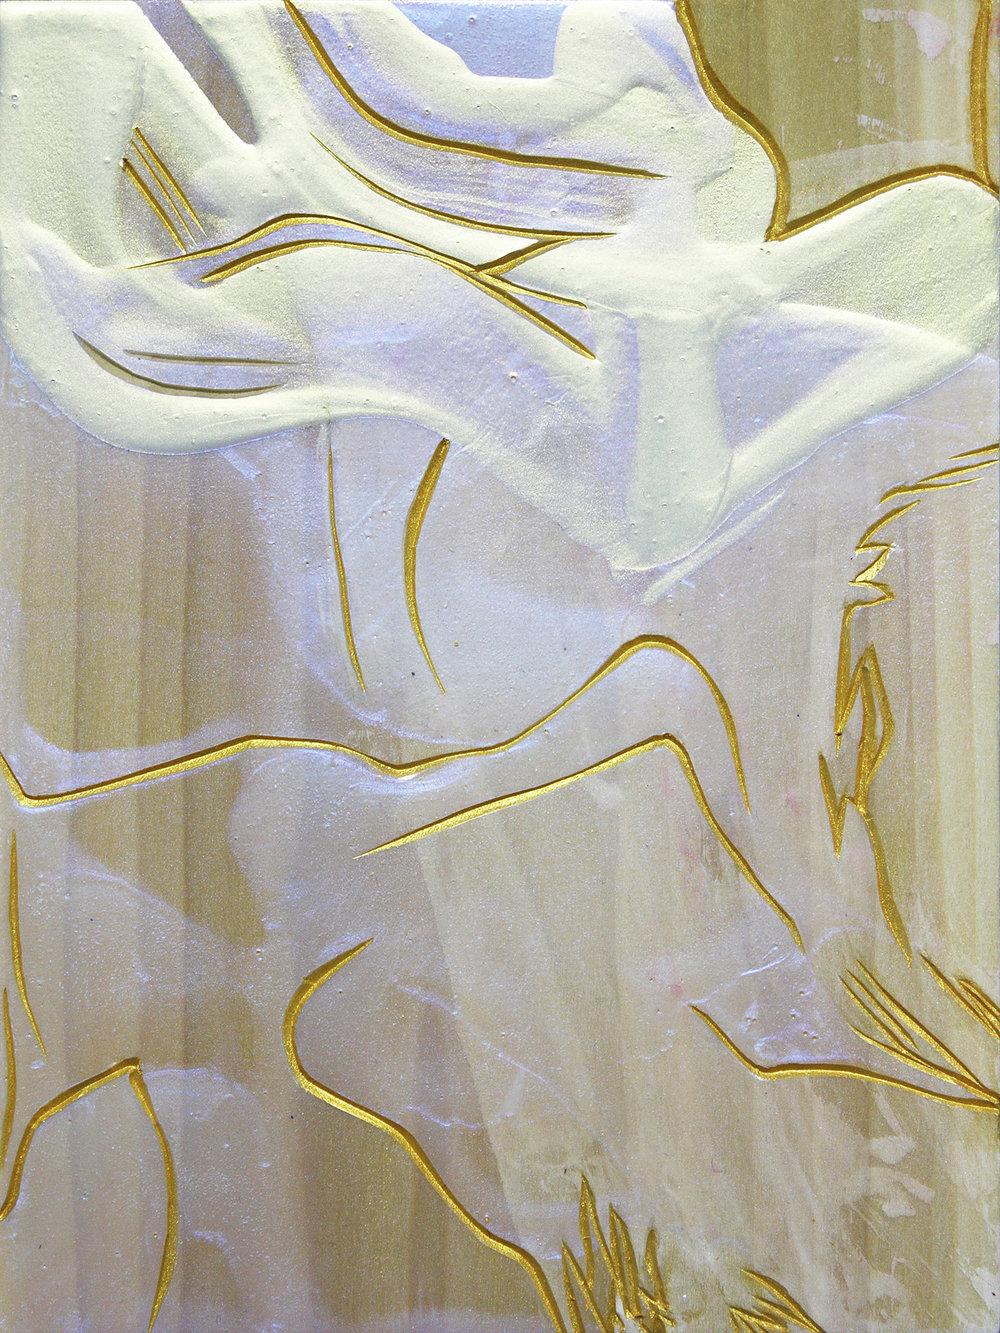 Awaited , 2015, acrylic on Japanese Magnolia, 20x15cm. (acquired)